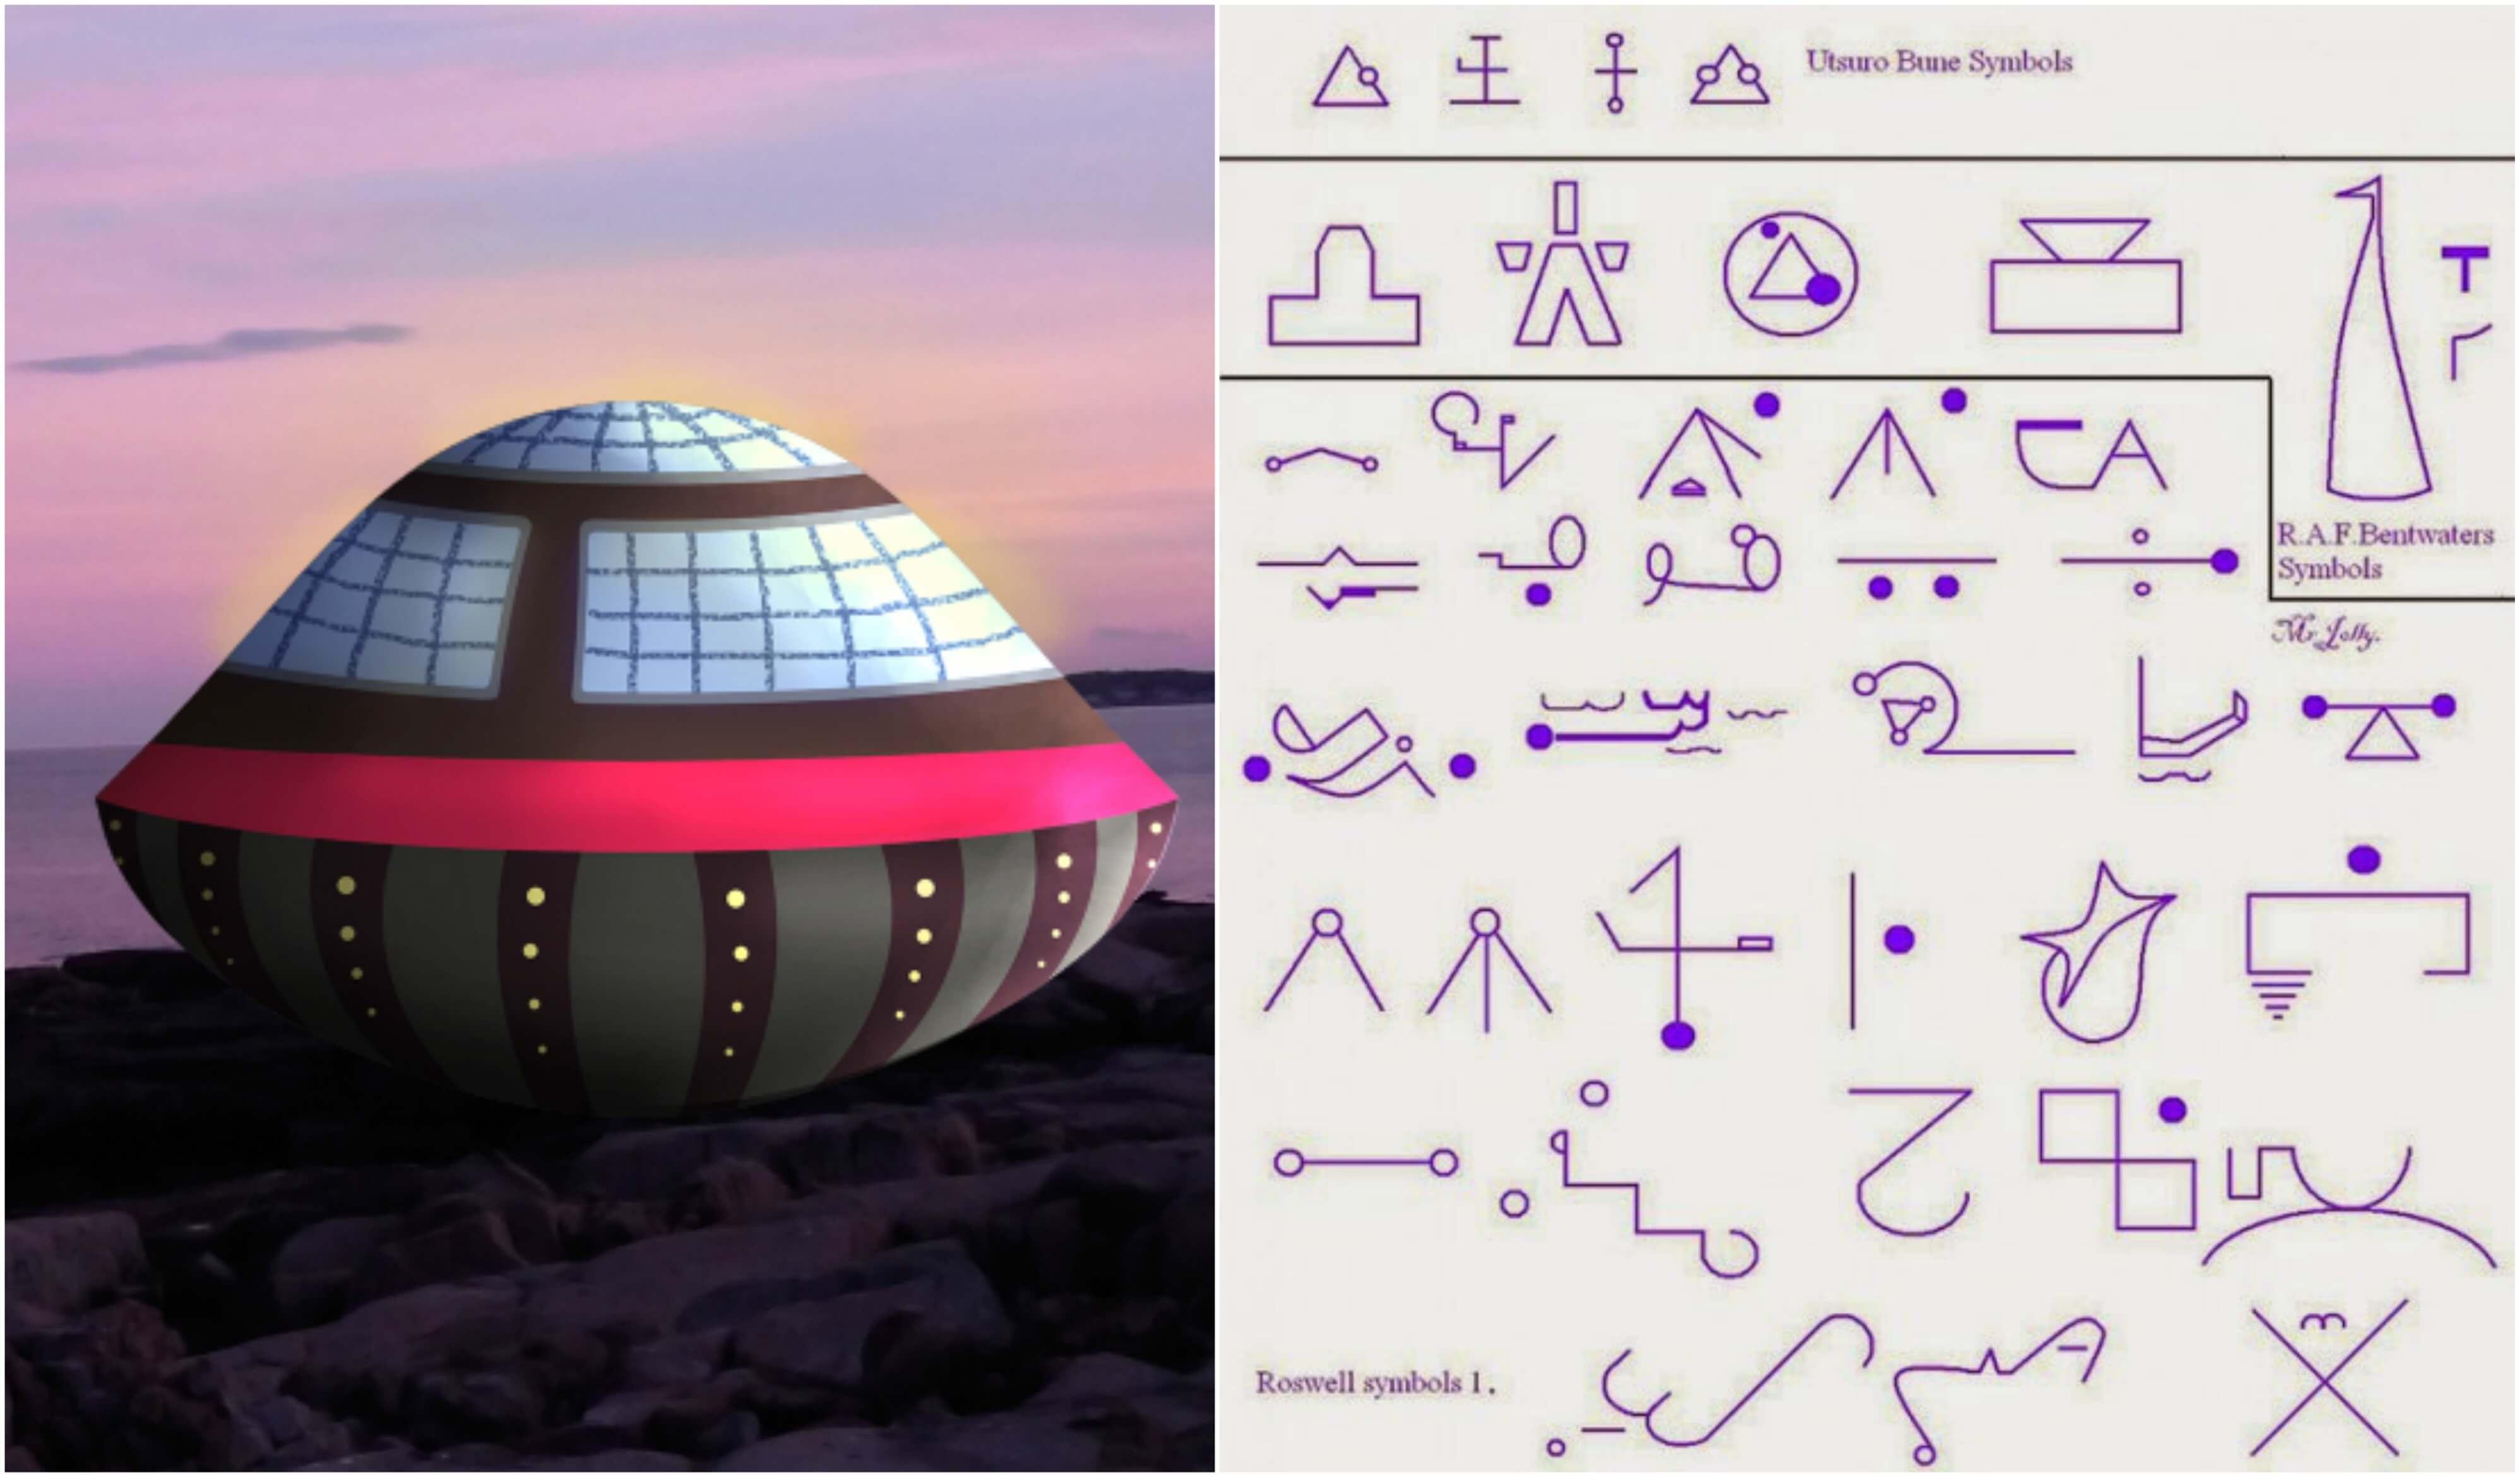 símbolos-utsuro-bume